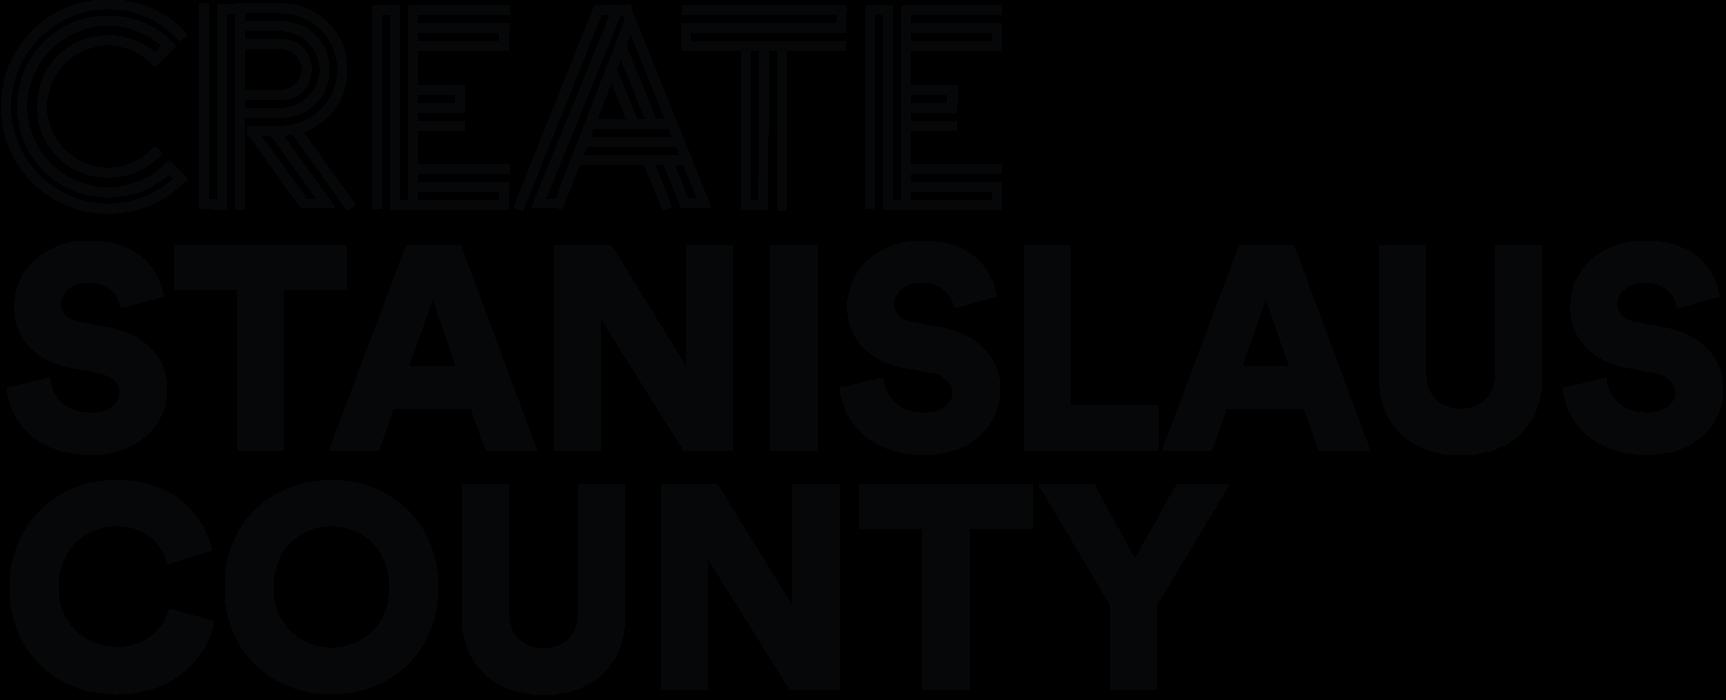 https://secureservercdn.net/198.71.233.51/mgq.552.myftpupload.com/wp-content/uploads/2020/01/Create-Ca-County-Logos-47-e1580495519183.png?time=1590882900